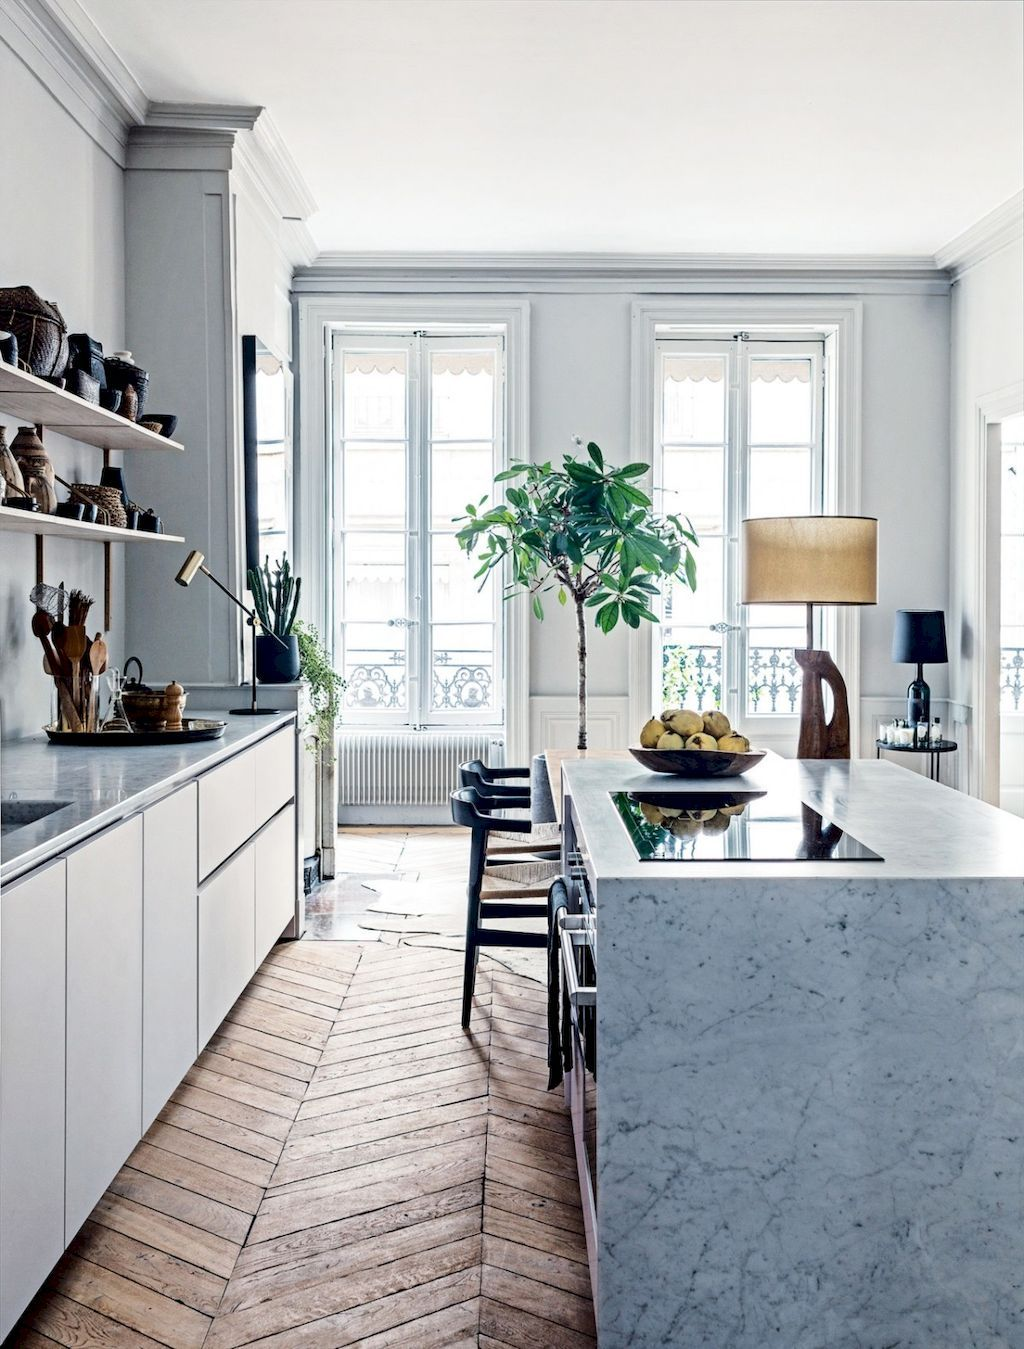 85 Rental Apartment Kitchen Organization Ideas   Apartment kitchen ...